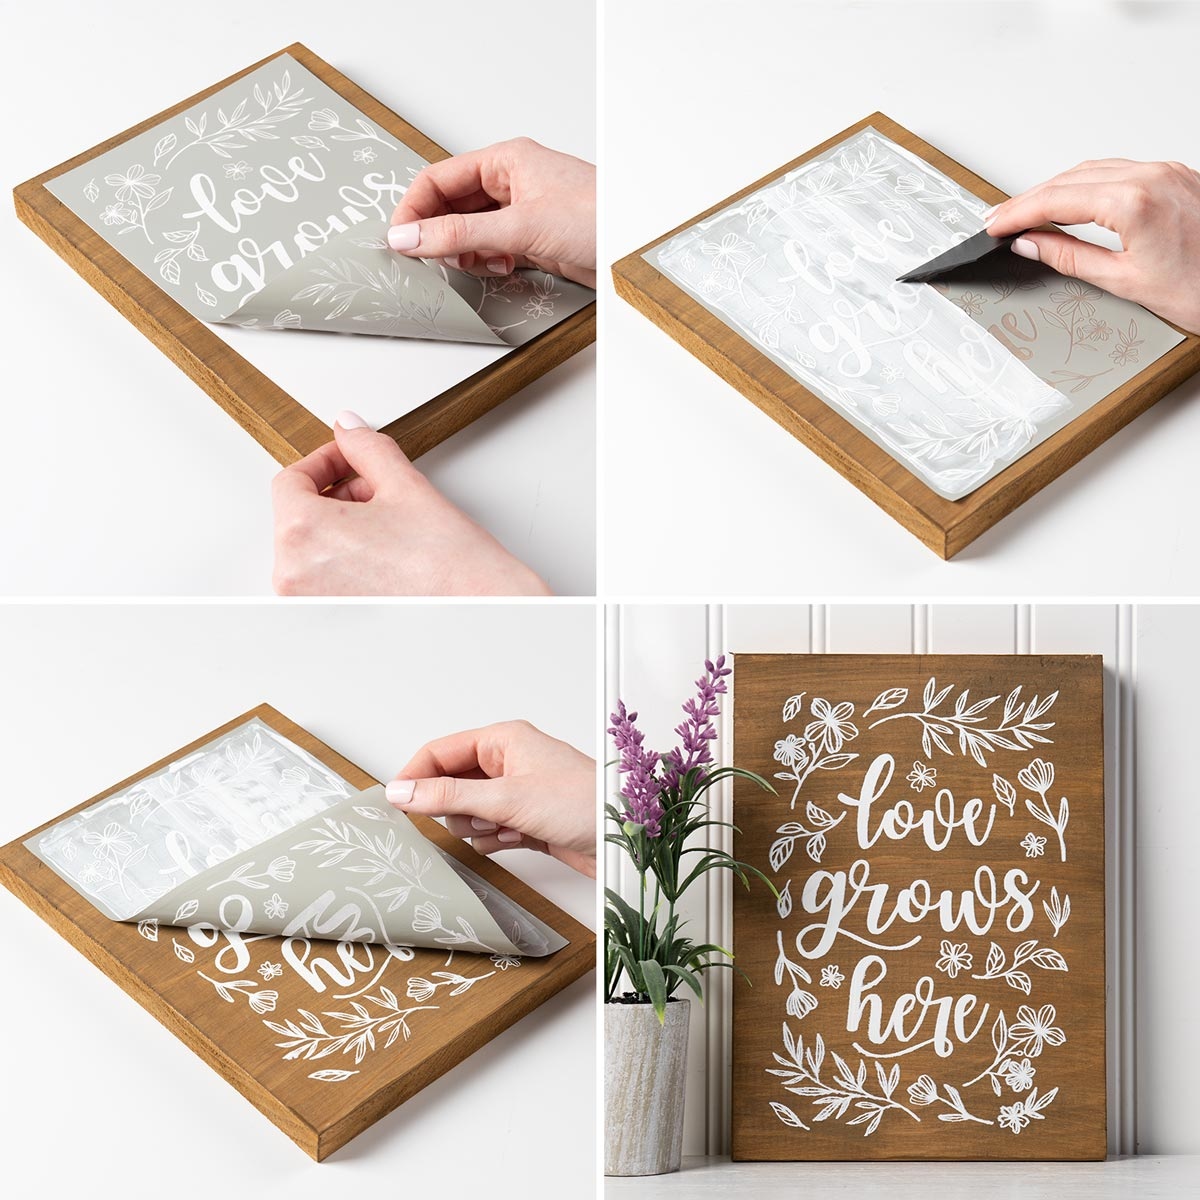 FolkArt ® Sign Shop™ Mesh Stencil - San Serif Letters - 63379